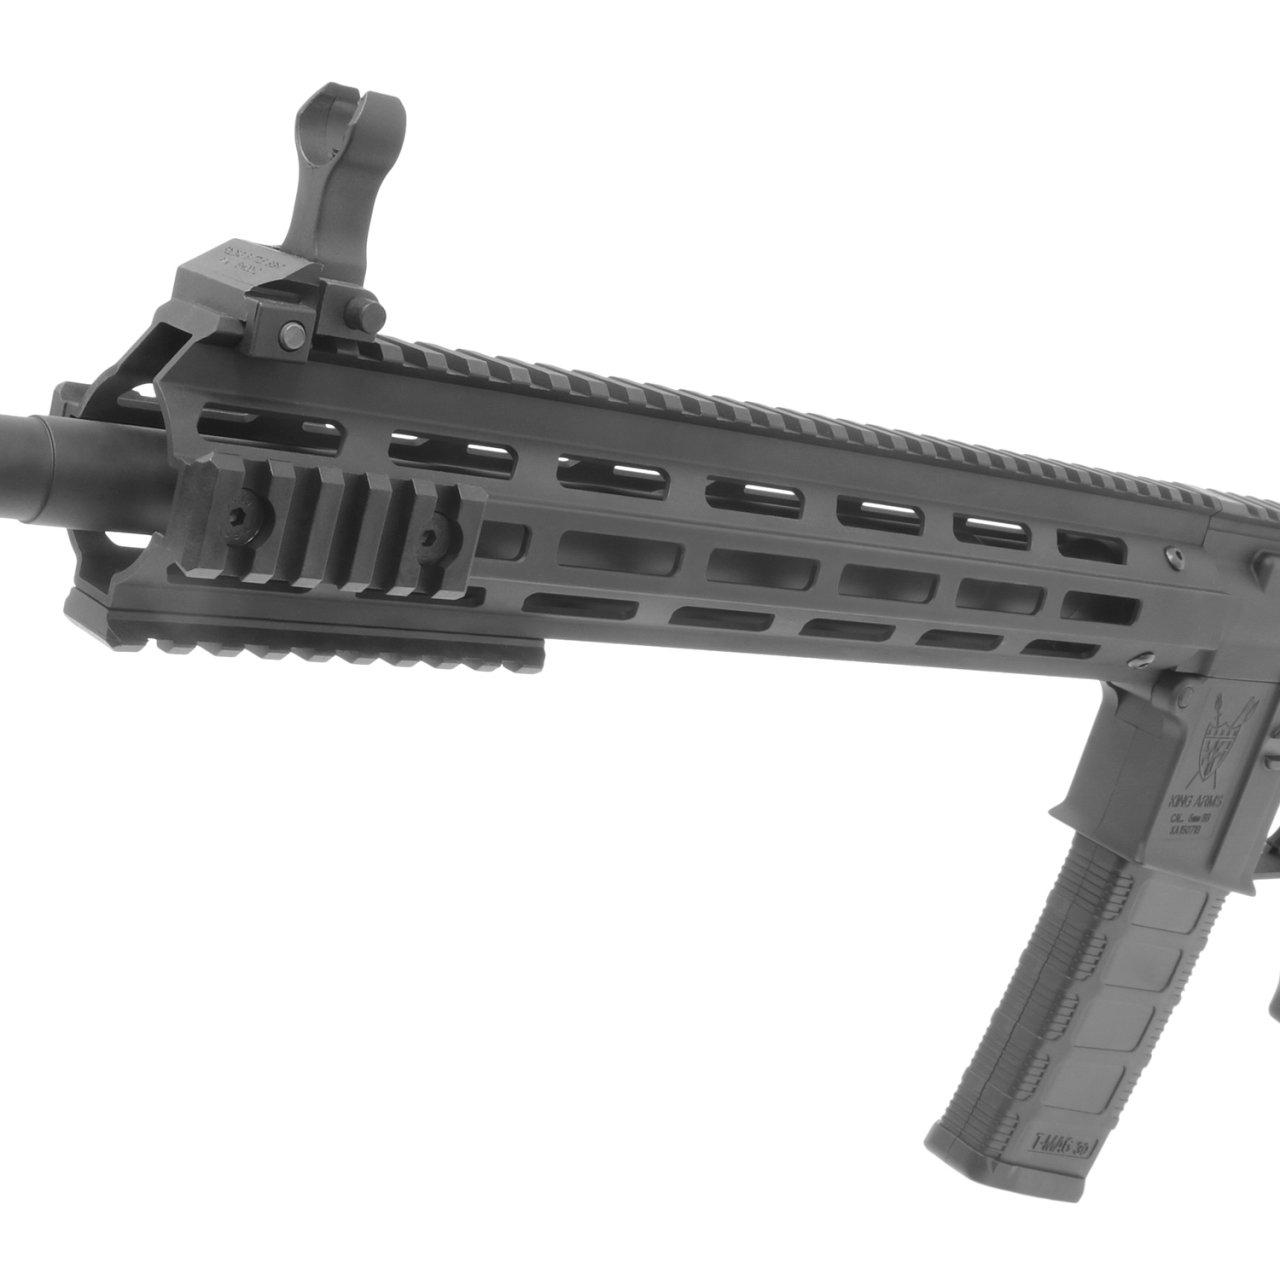 KingArms TWS M4A1 Pil Şarj Hediye Seti 210-BK